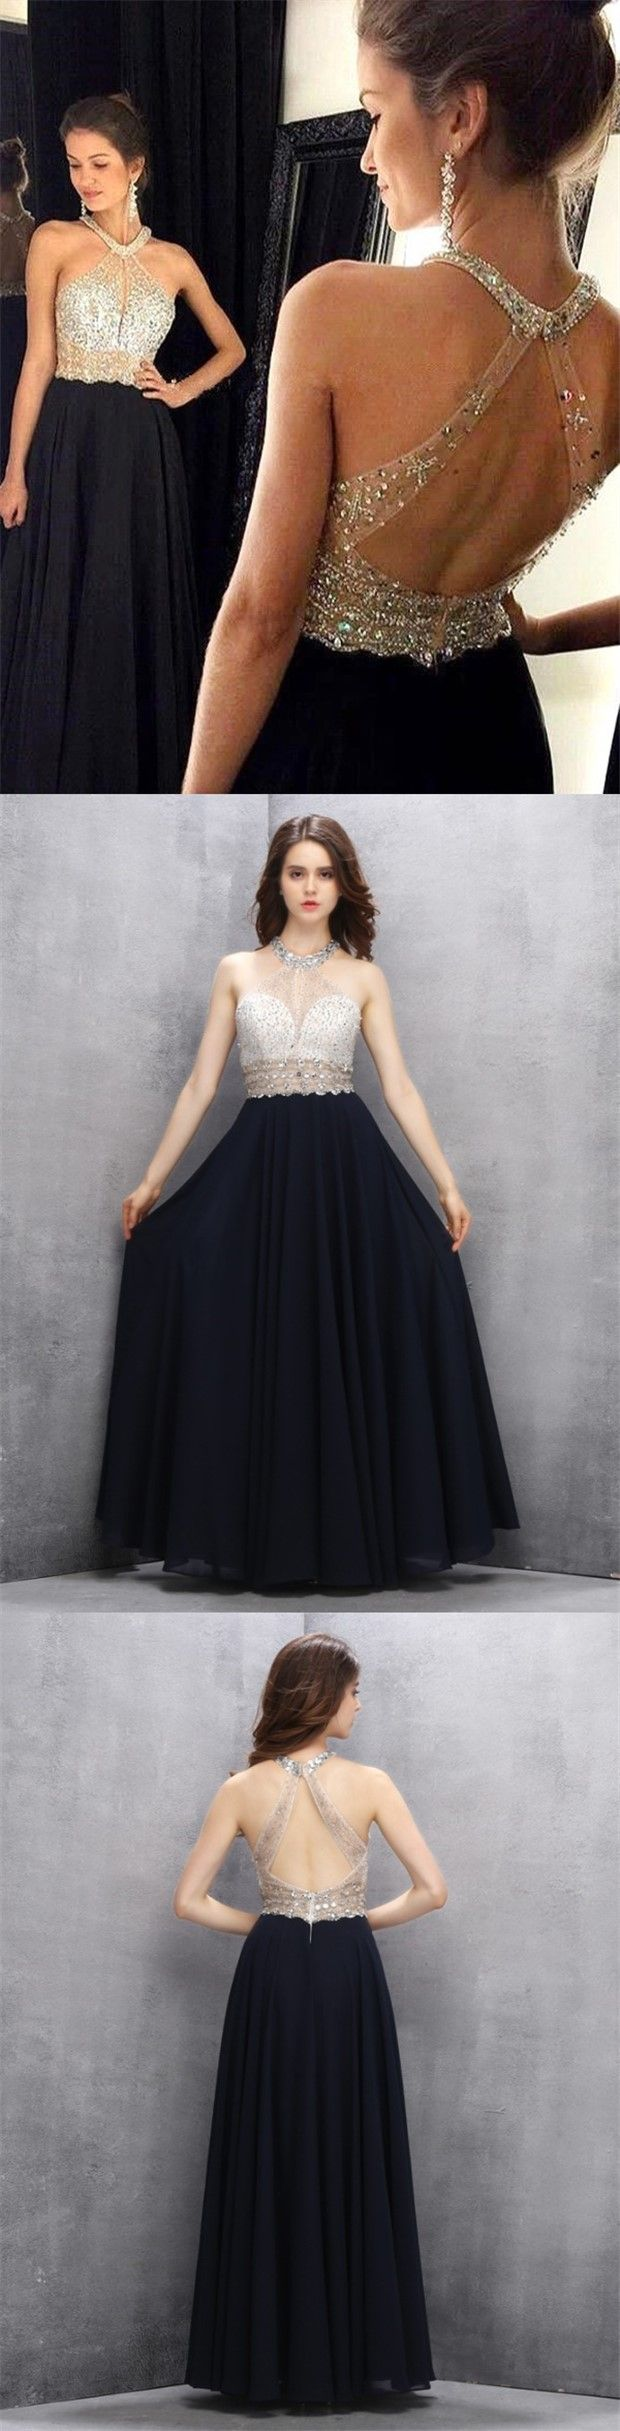 83713c98546 A-Line Jewel Keyhole Black Chiffon Open Back Prom Dress with Beading ...